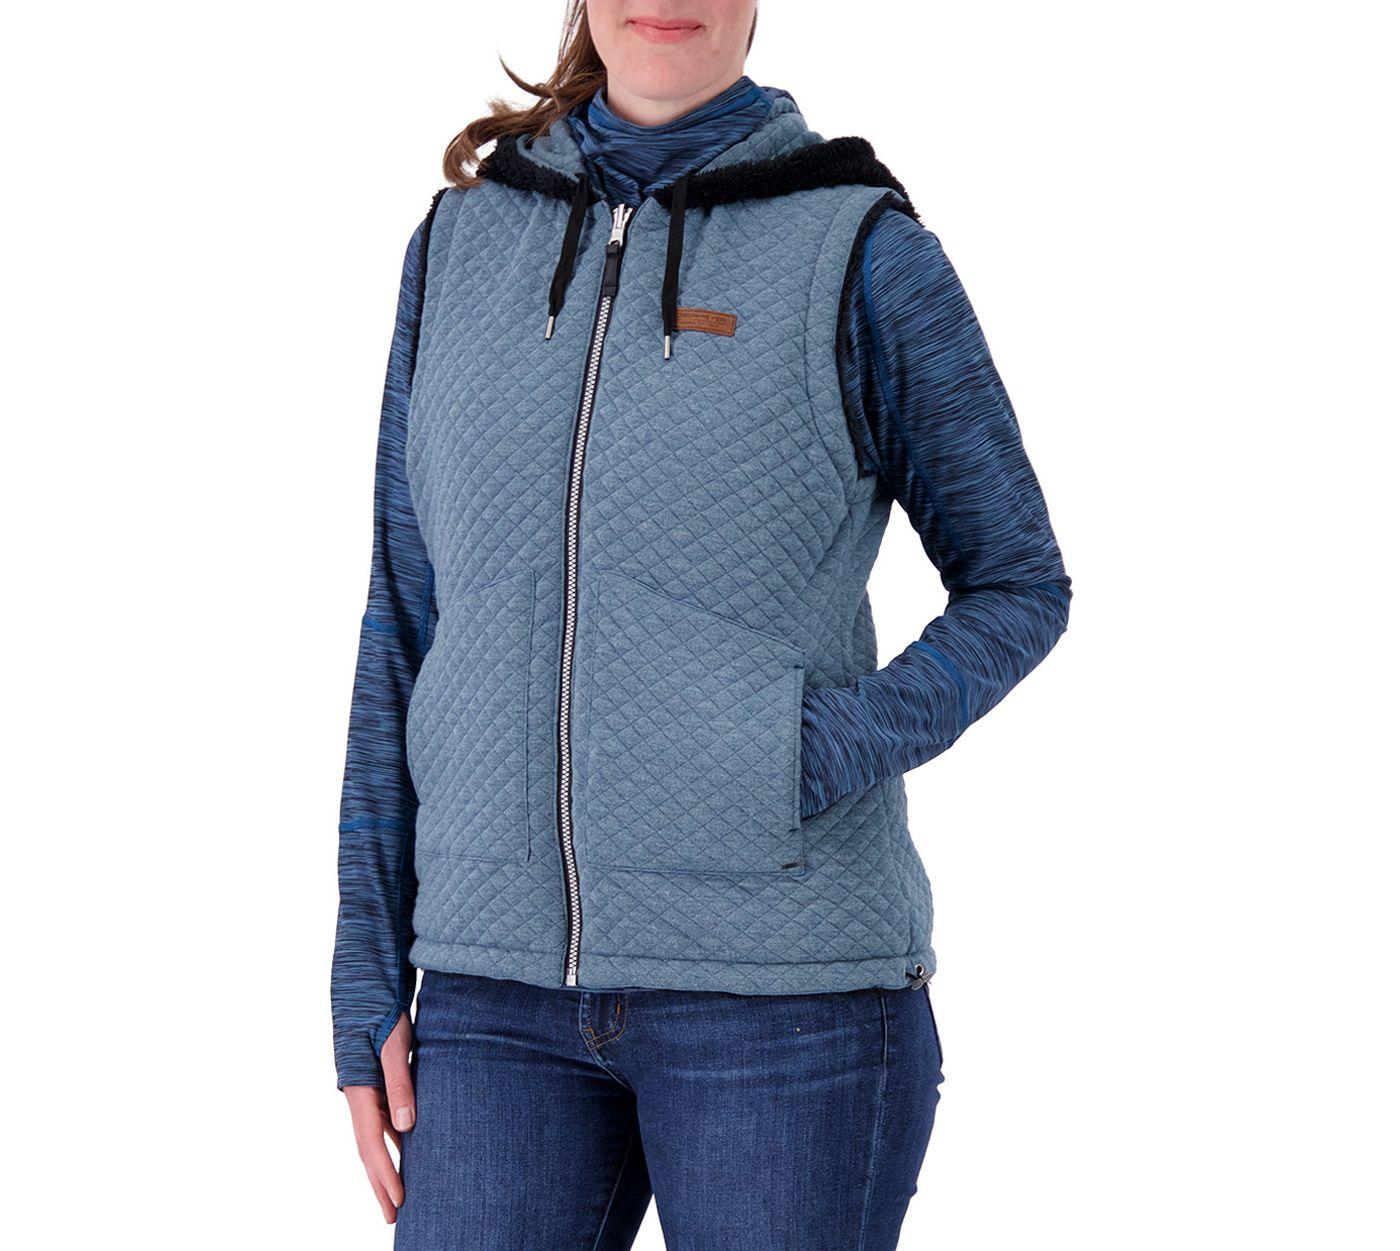 Obermeyer Women's Reversible Greyson Vest